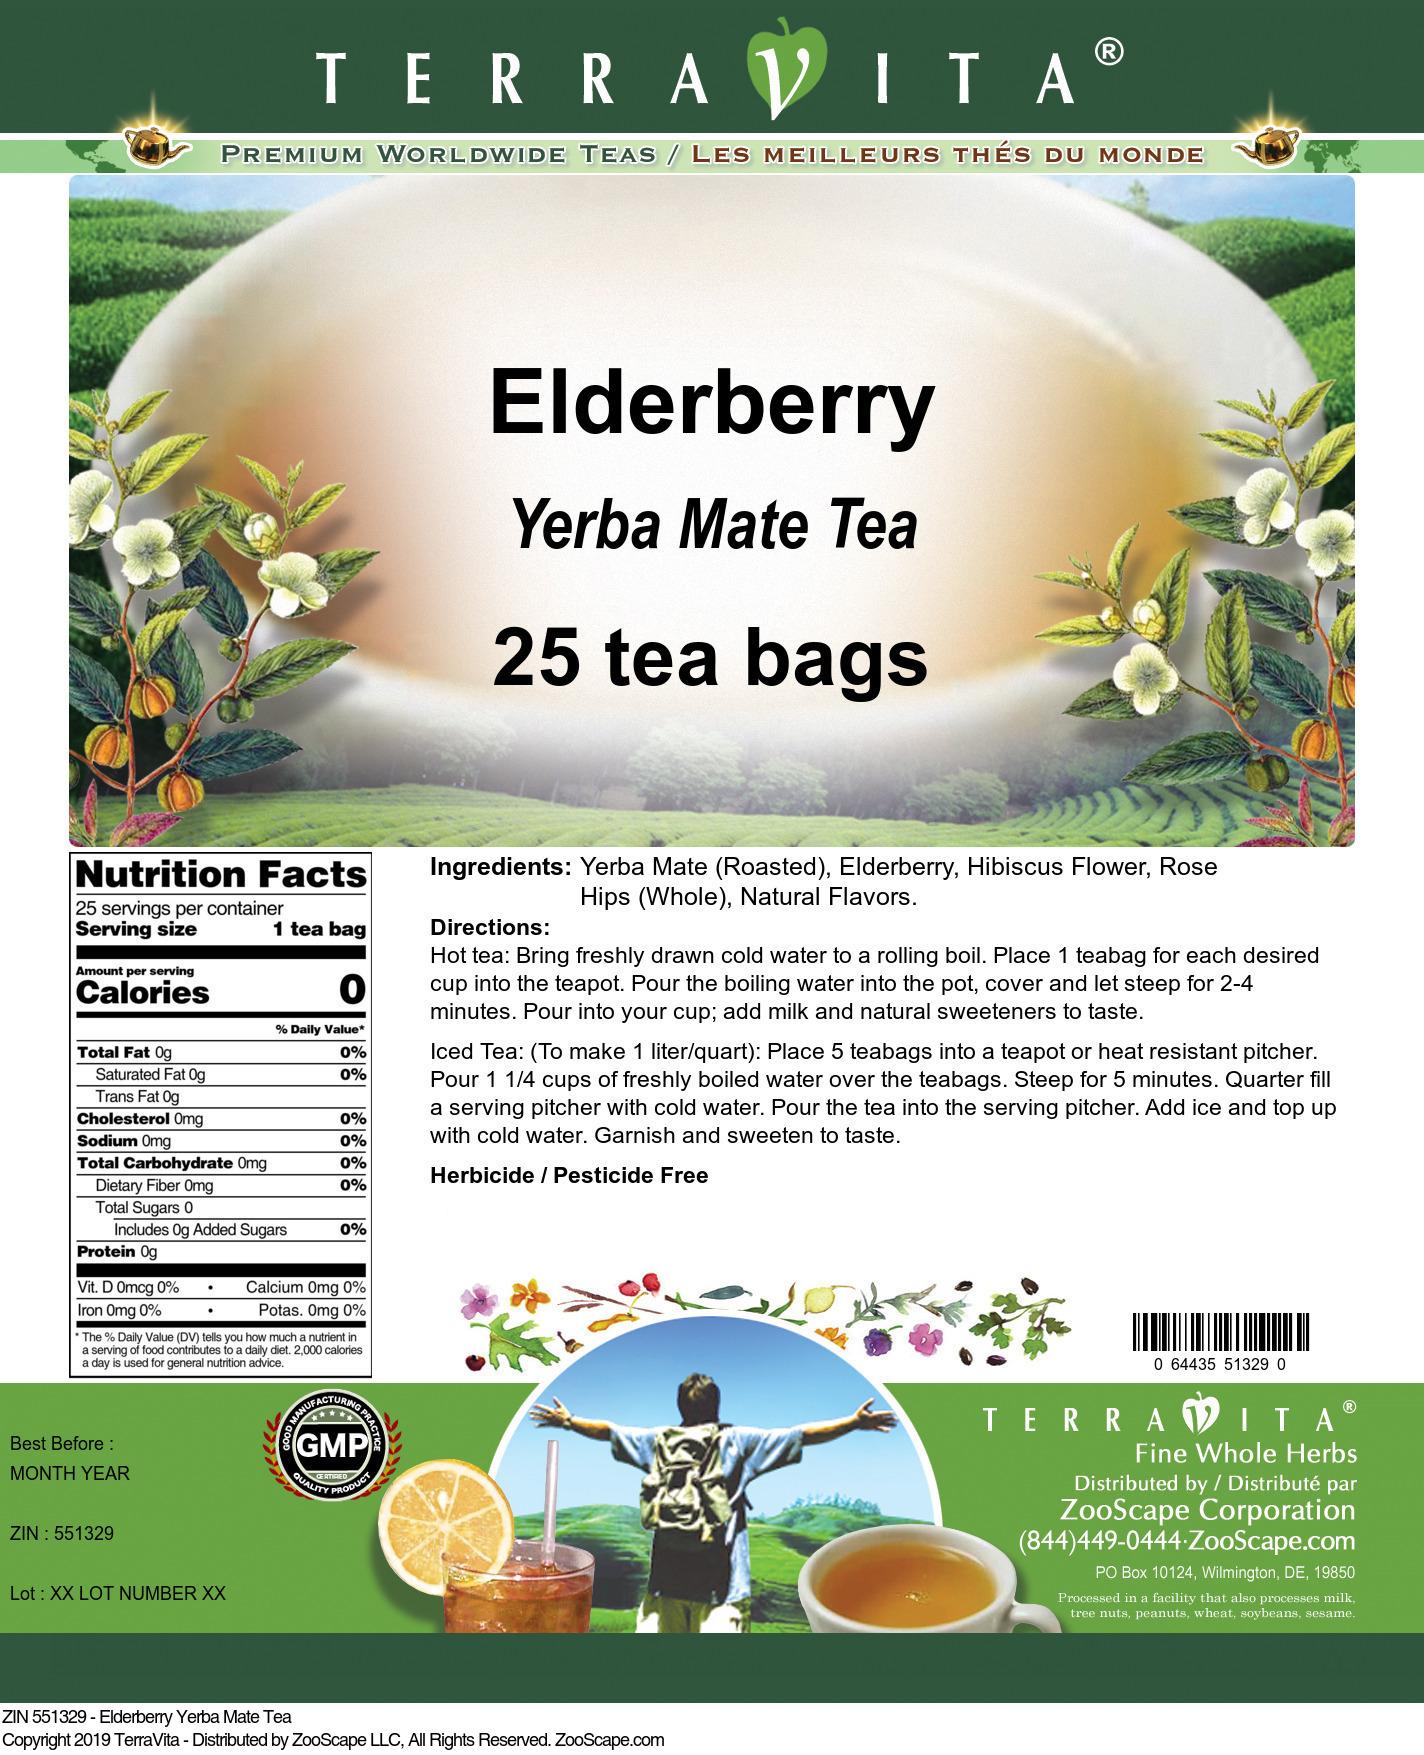 Elderberry Yerba Mate Tea